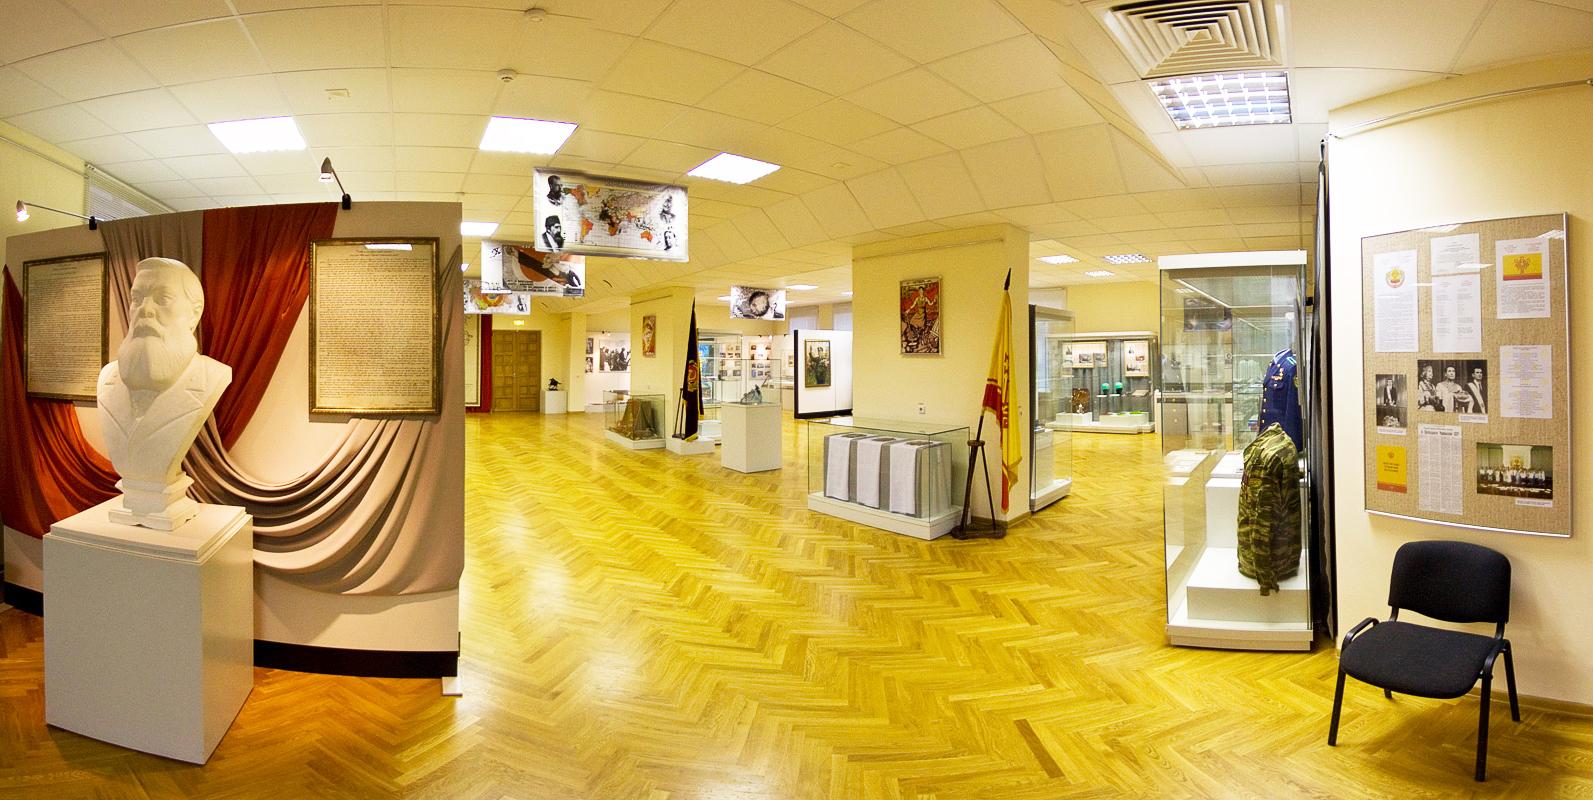 электролита краеведческий музей чебоксары фото мальчика